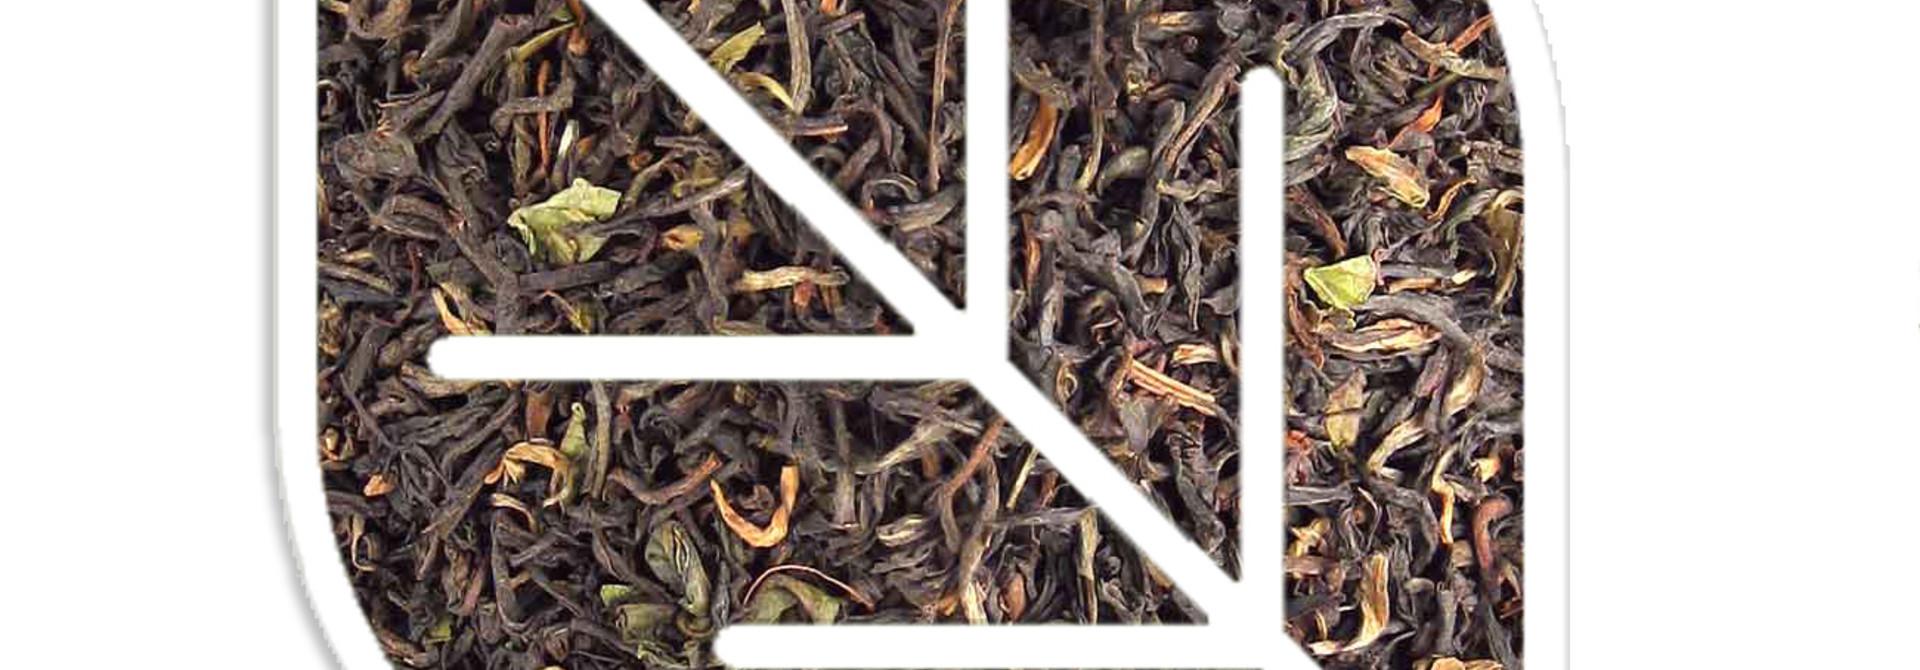 Oostfriesen Melange Blad thee 2